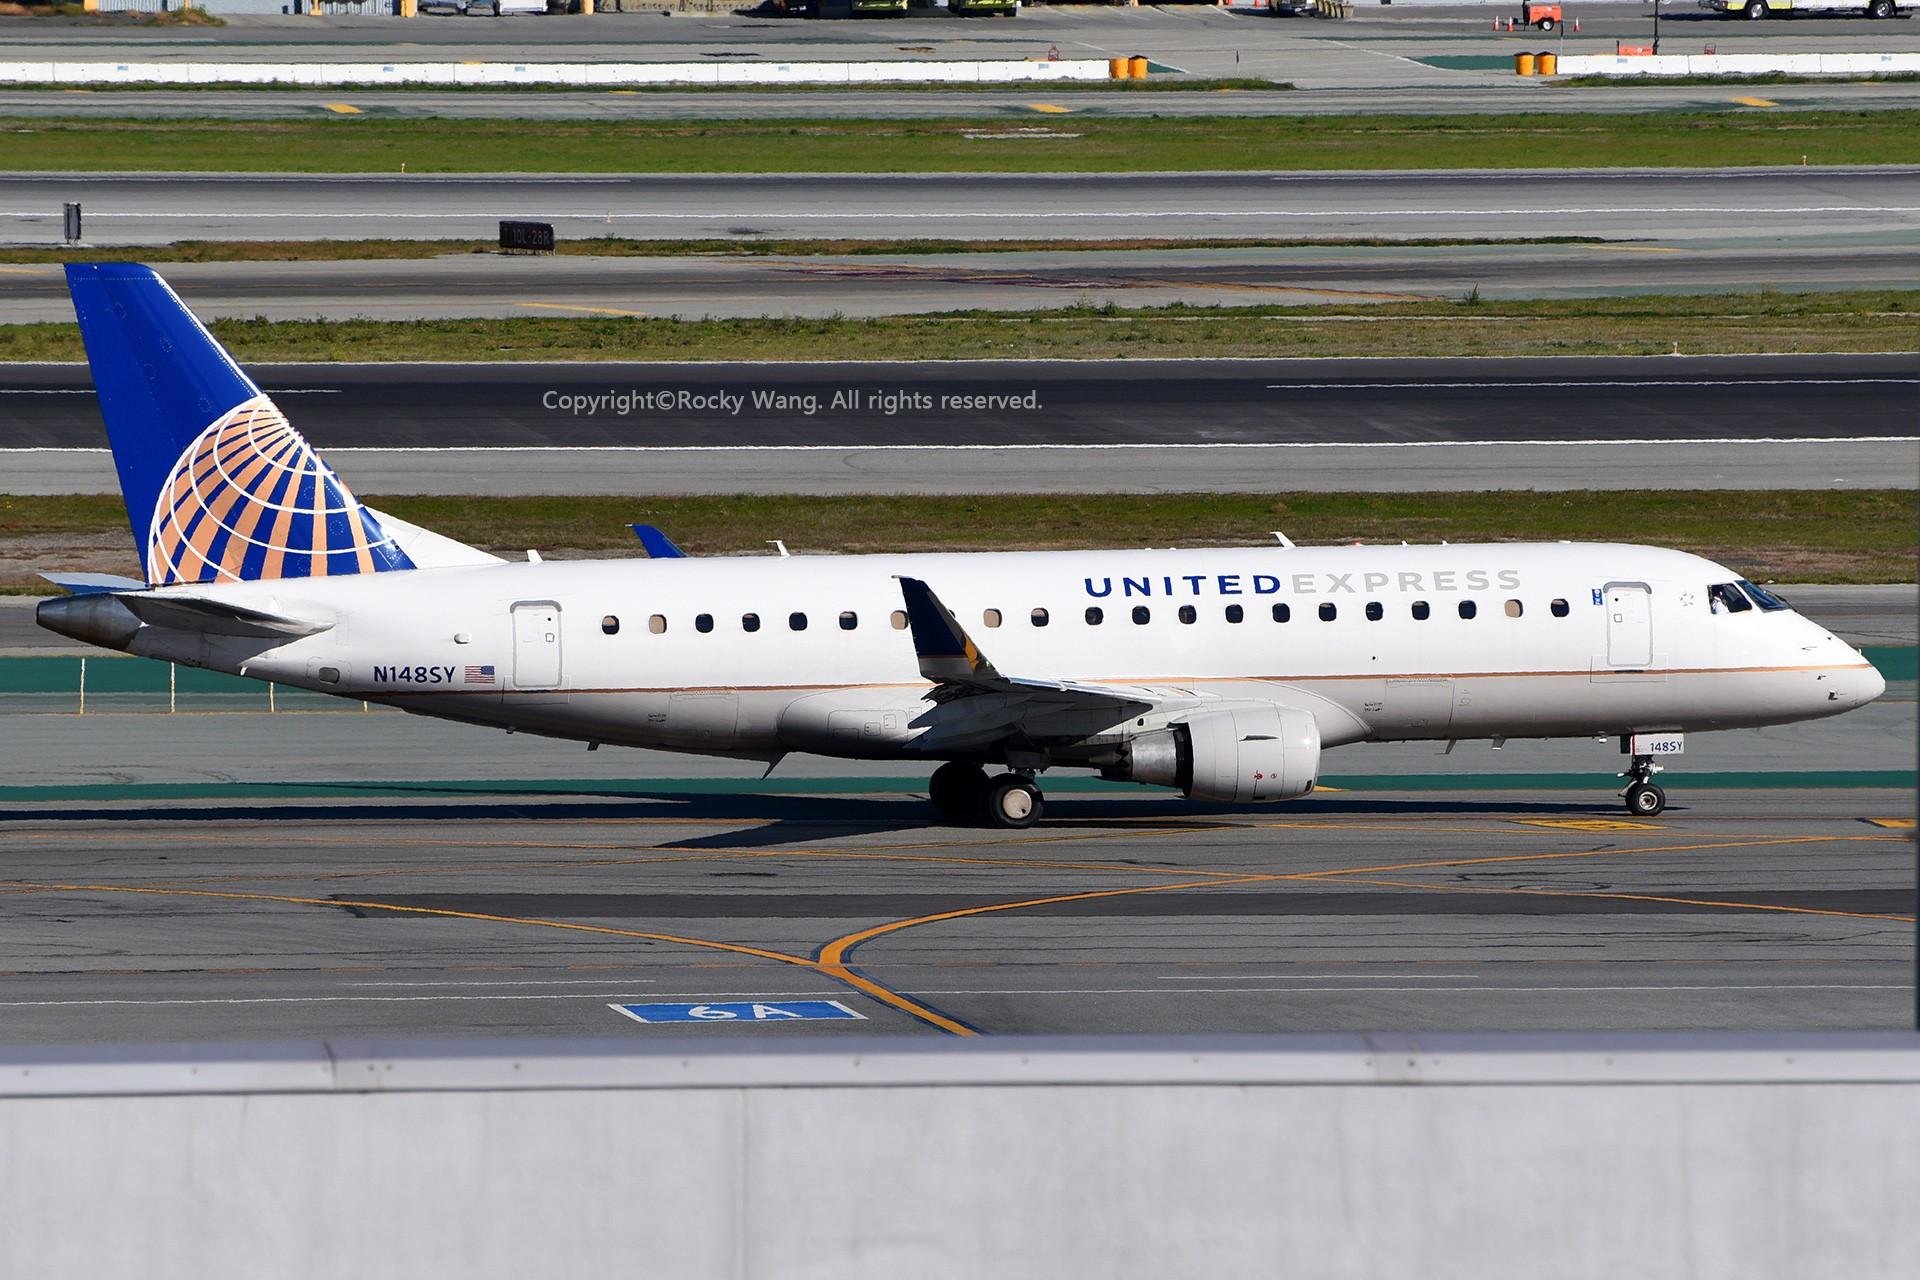 Re:[原创]窄体连连看 EMBRAER 170-200LR N148SY 美国旧金山机场